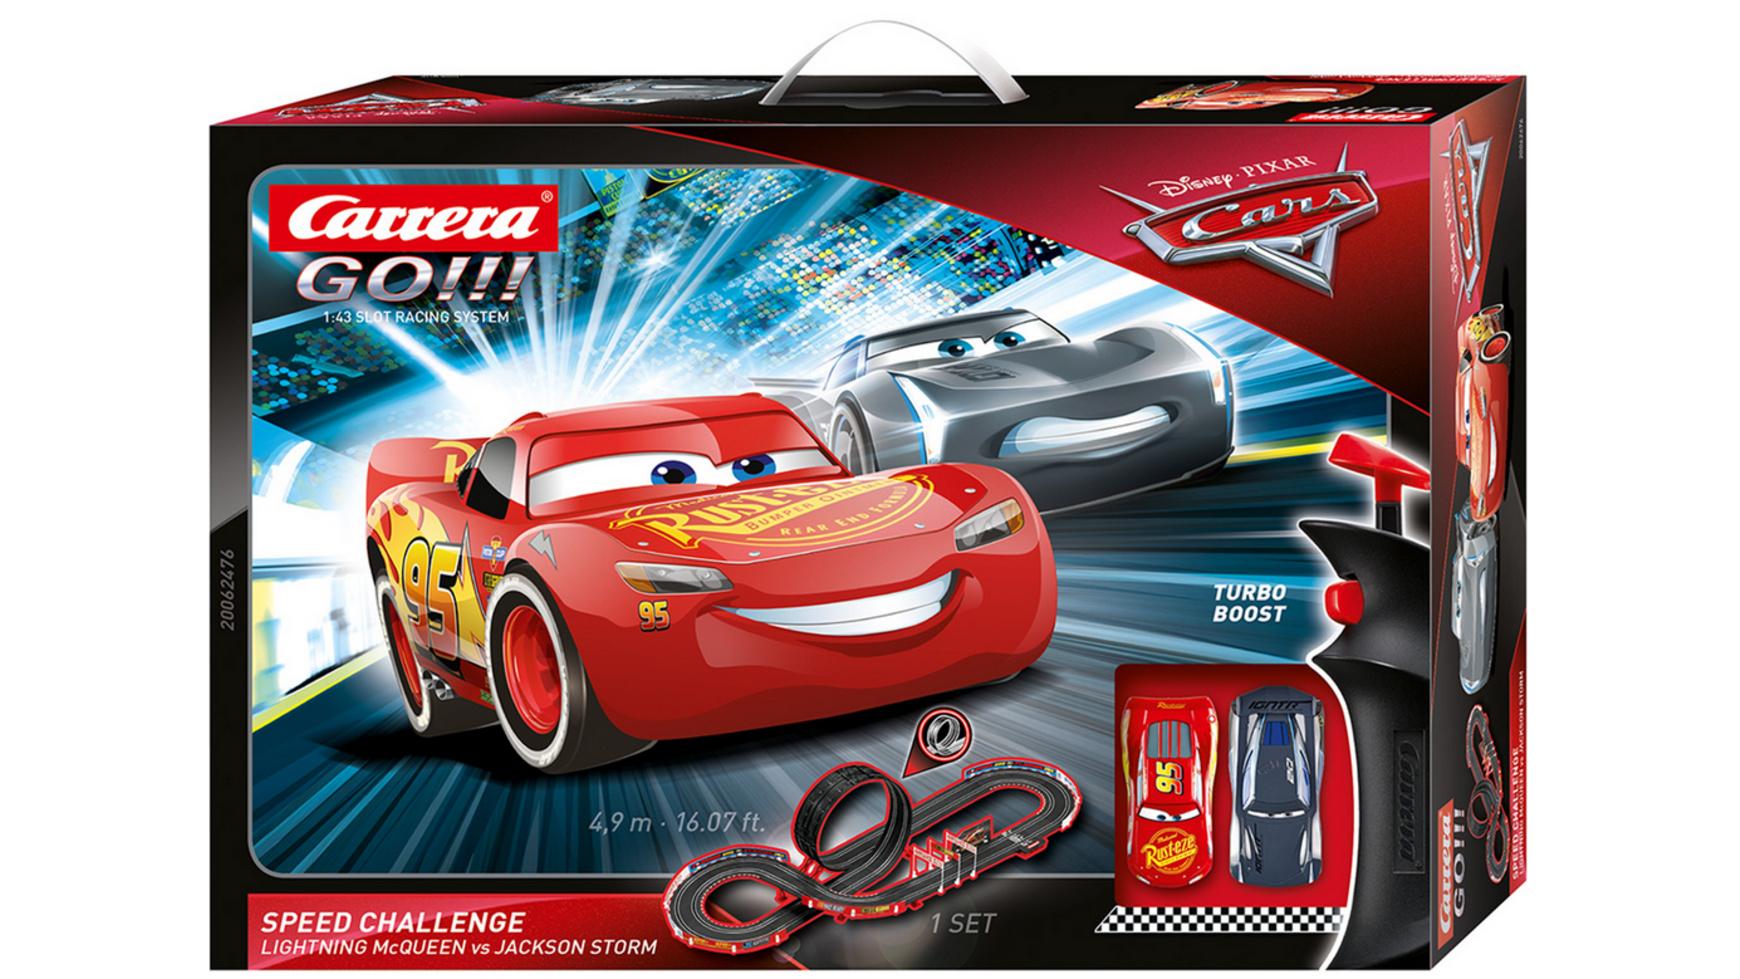 [Müller - Filial+Filiallieferung] Carrera GO!!! - Disney·Pixar Cars - Speed Challenge